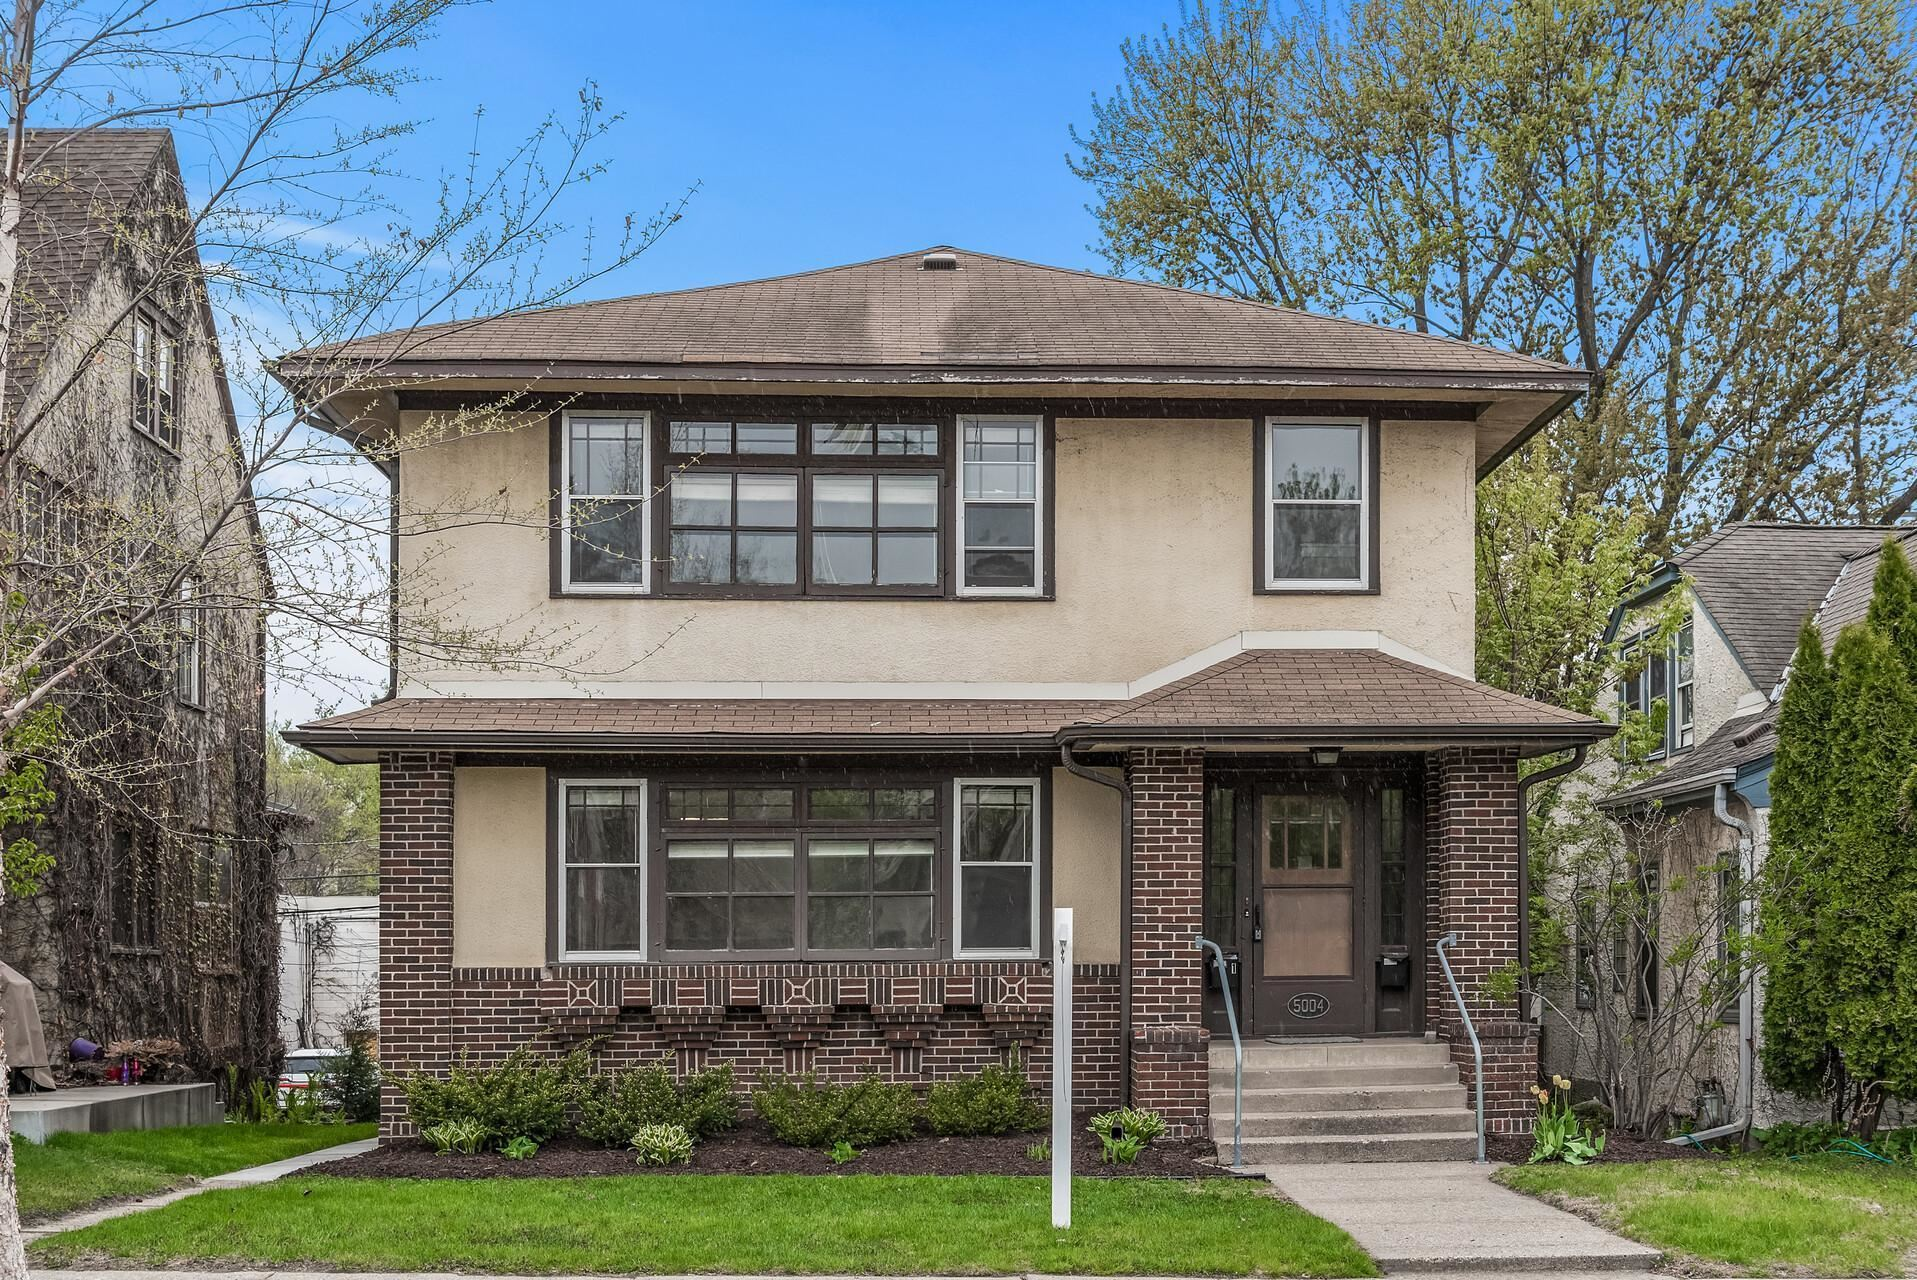 5004 Oliver Avenue S, Minneapolis, MN 55419 - MLS#: 5749571